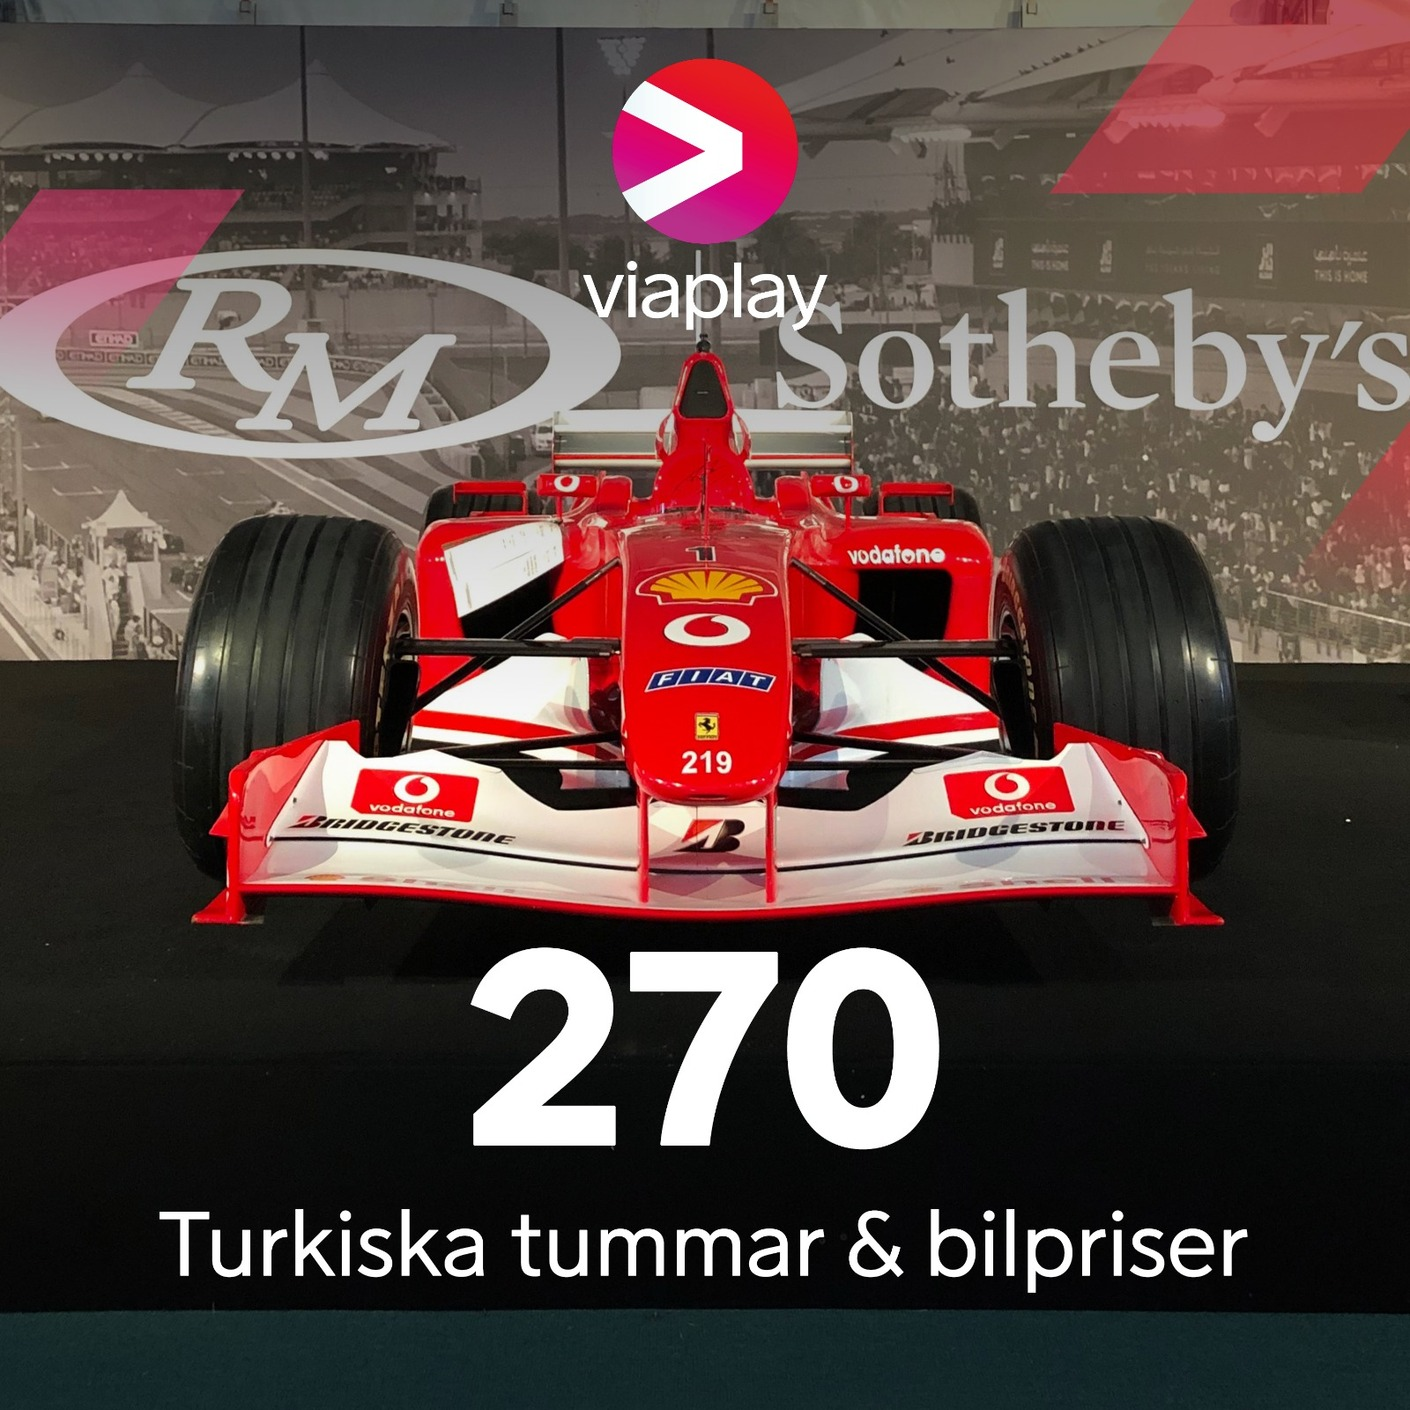 270. Turkiska tummar & bilpriser